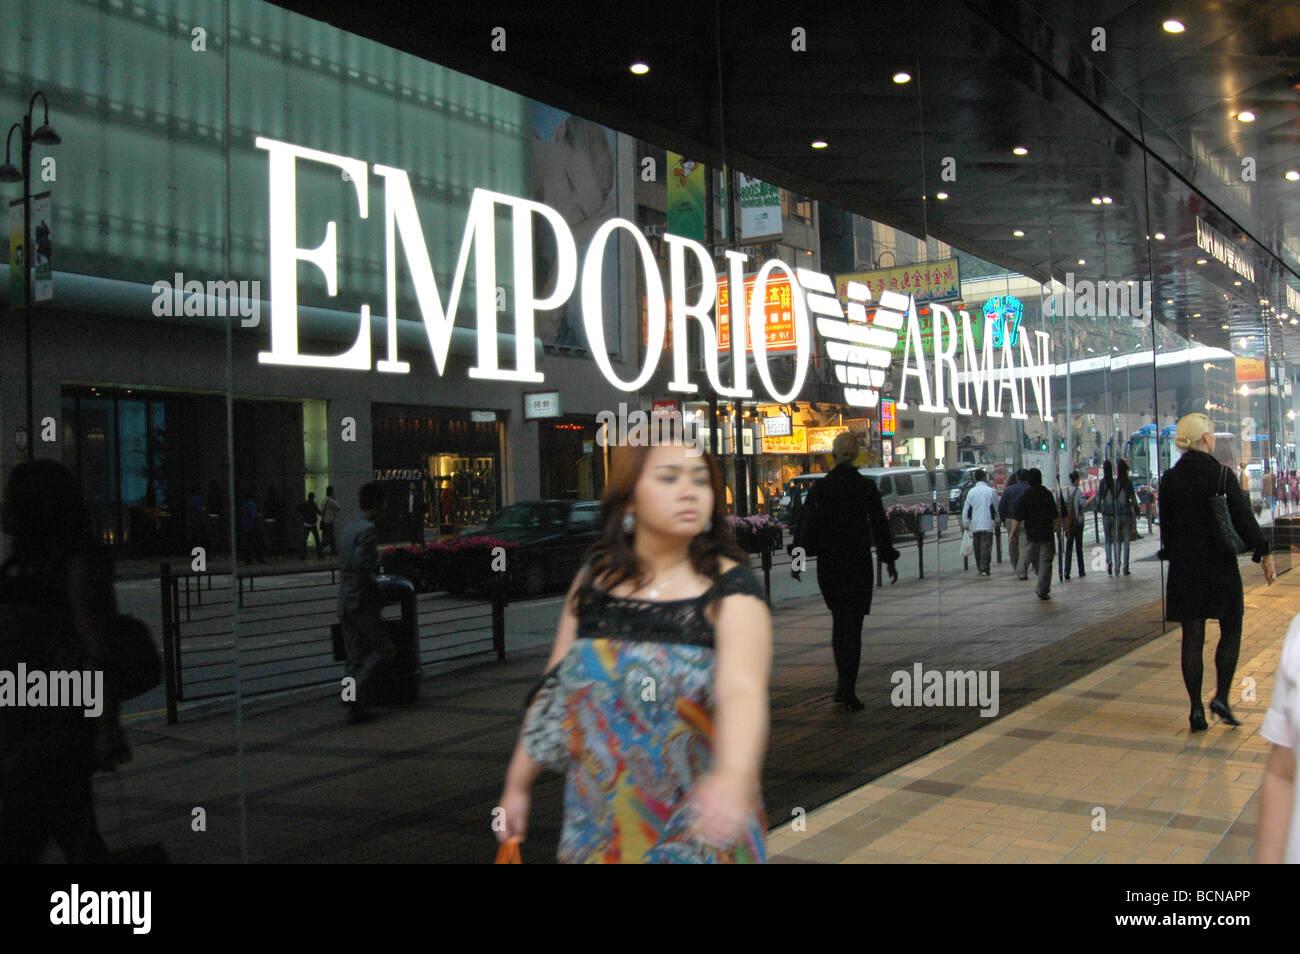 Jeune femme chinoise à pied passer le magasin phare d Emporio Armani,  Shanghai, Chine 90c9c4e31f70